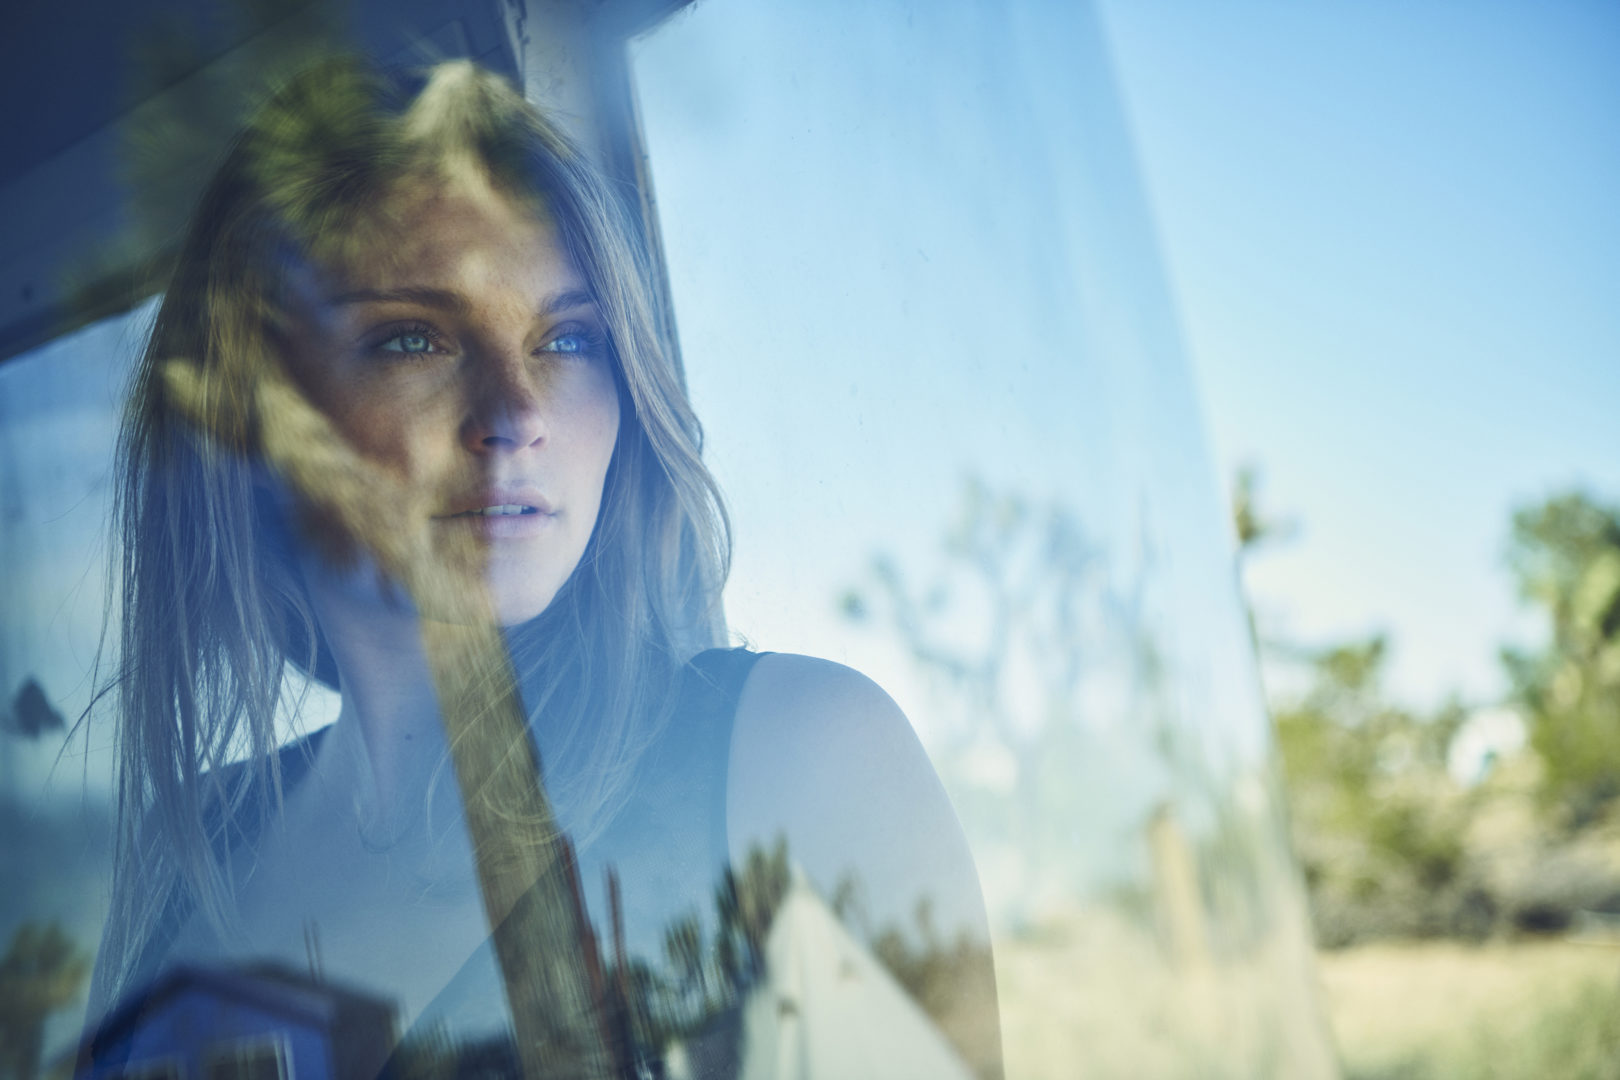 portrait of girl in trailer